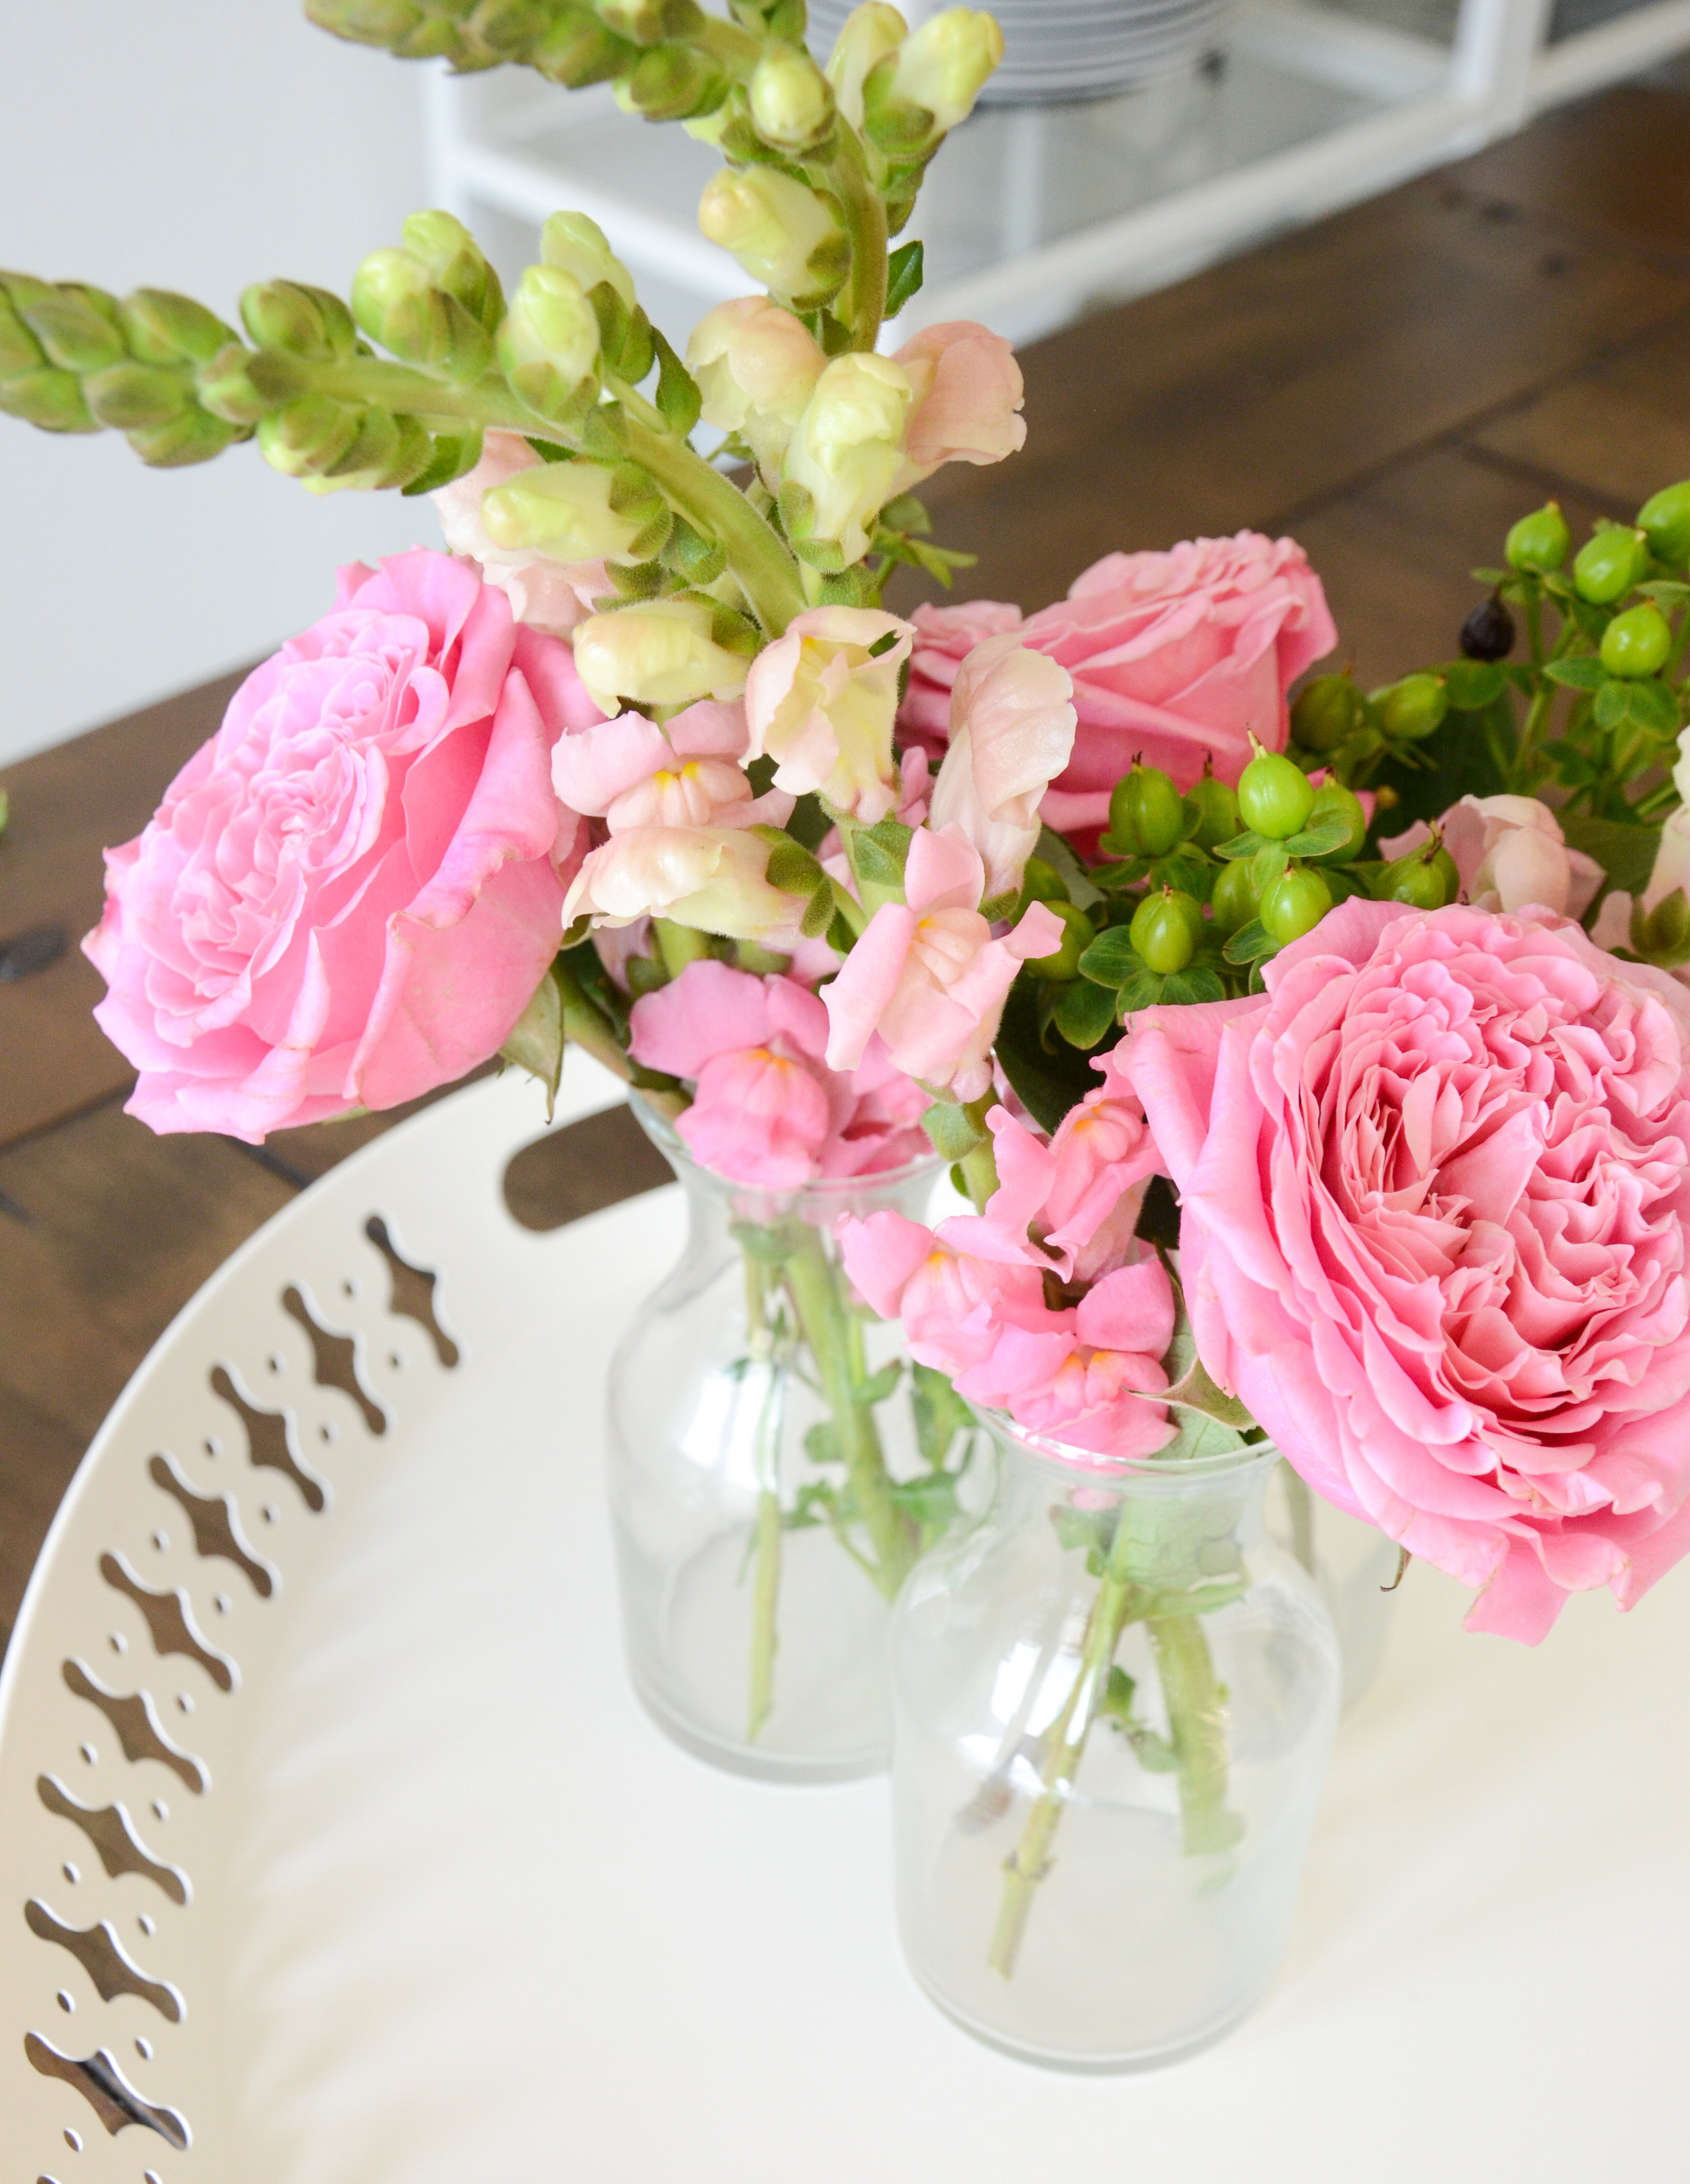 flowers bud vases above.jpg